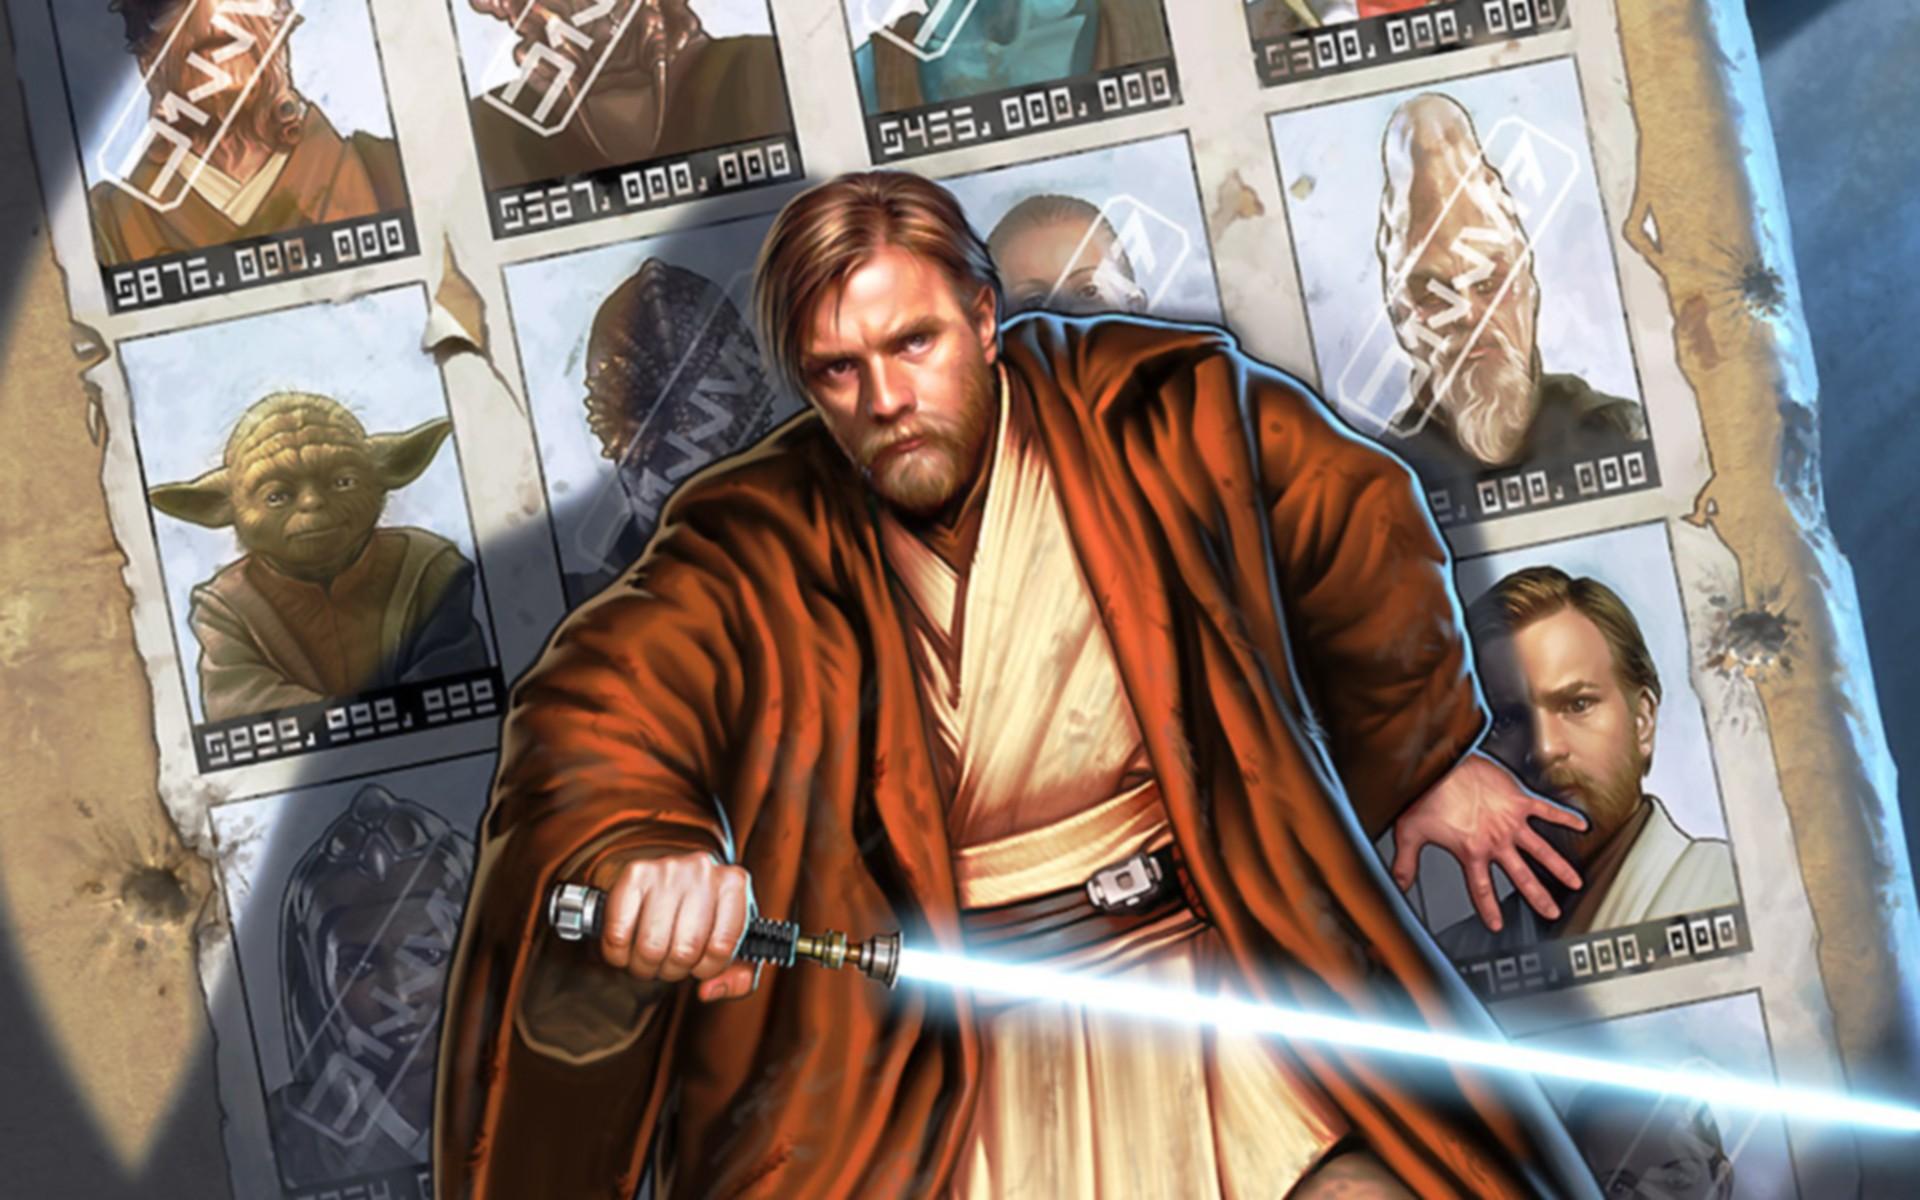 Wallpaper Star Wars Artwork Lightsaber Jedi Comics Obi Wan Kenobi Screenshot Comic Book 1920x1200 Mbourrig 223734 Hd Wallpapers Wallhere